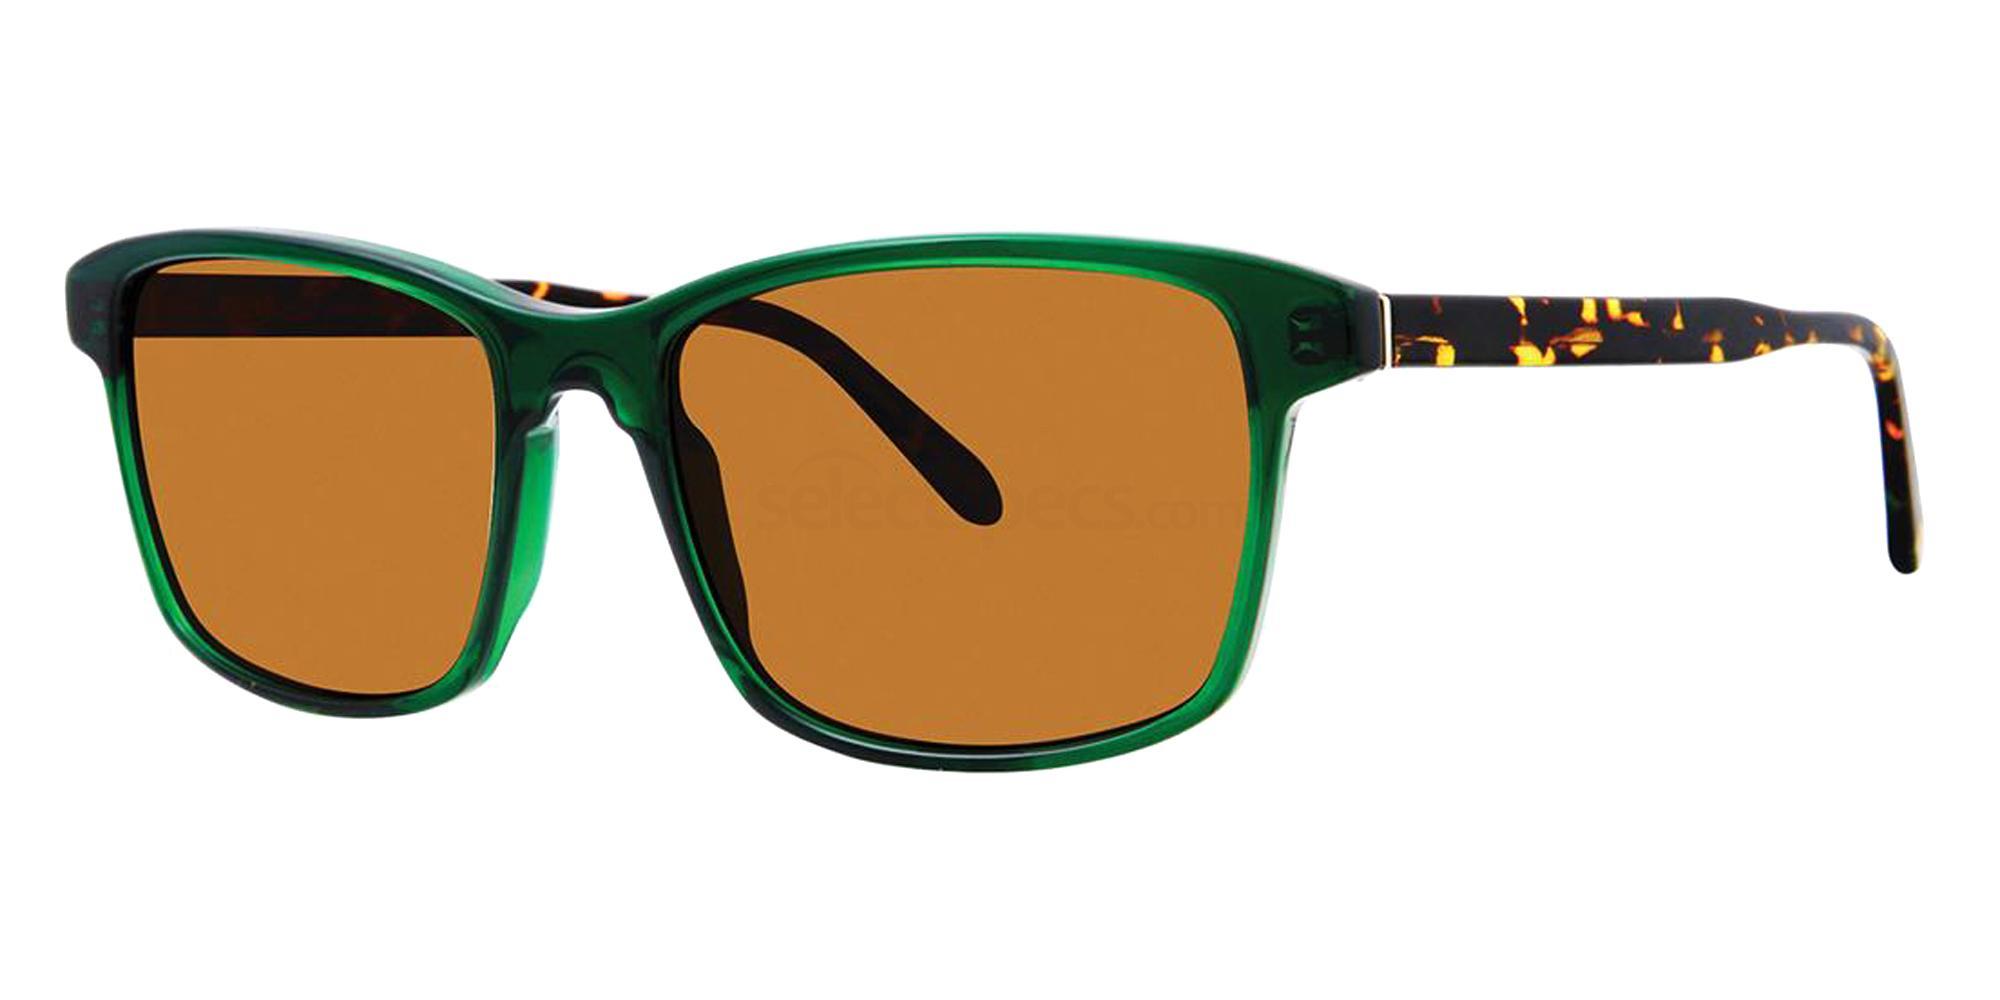 Bosphorus Green THE JACK SUN Sunglasses, Original Penguin